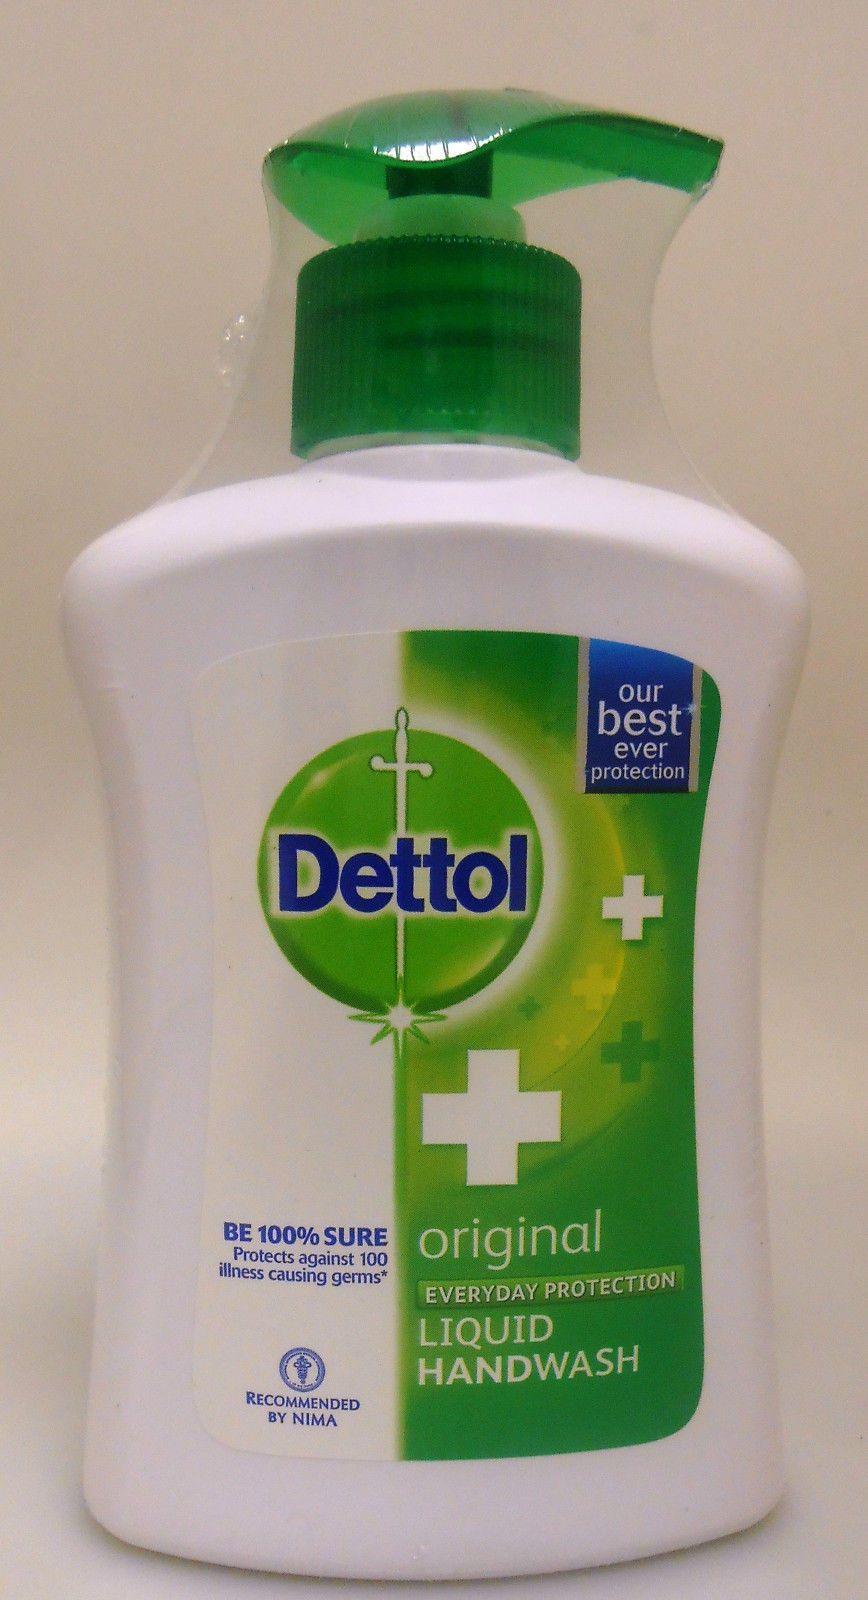 Dettol Hand Washes Ebay Fashion Products Hand Washing Soap